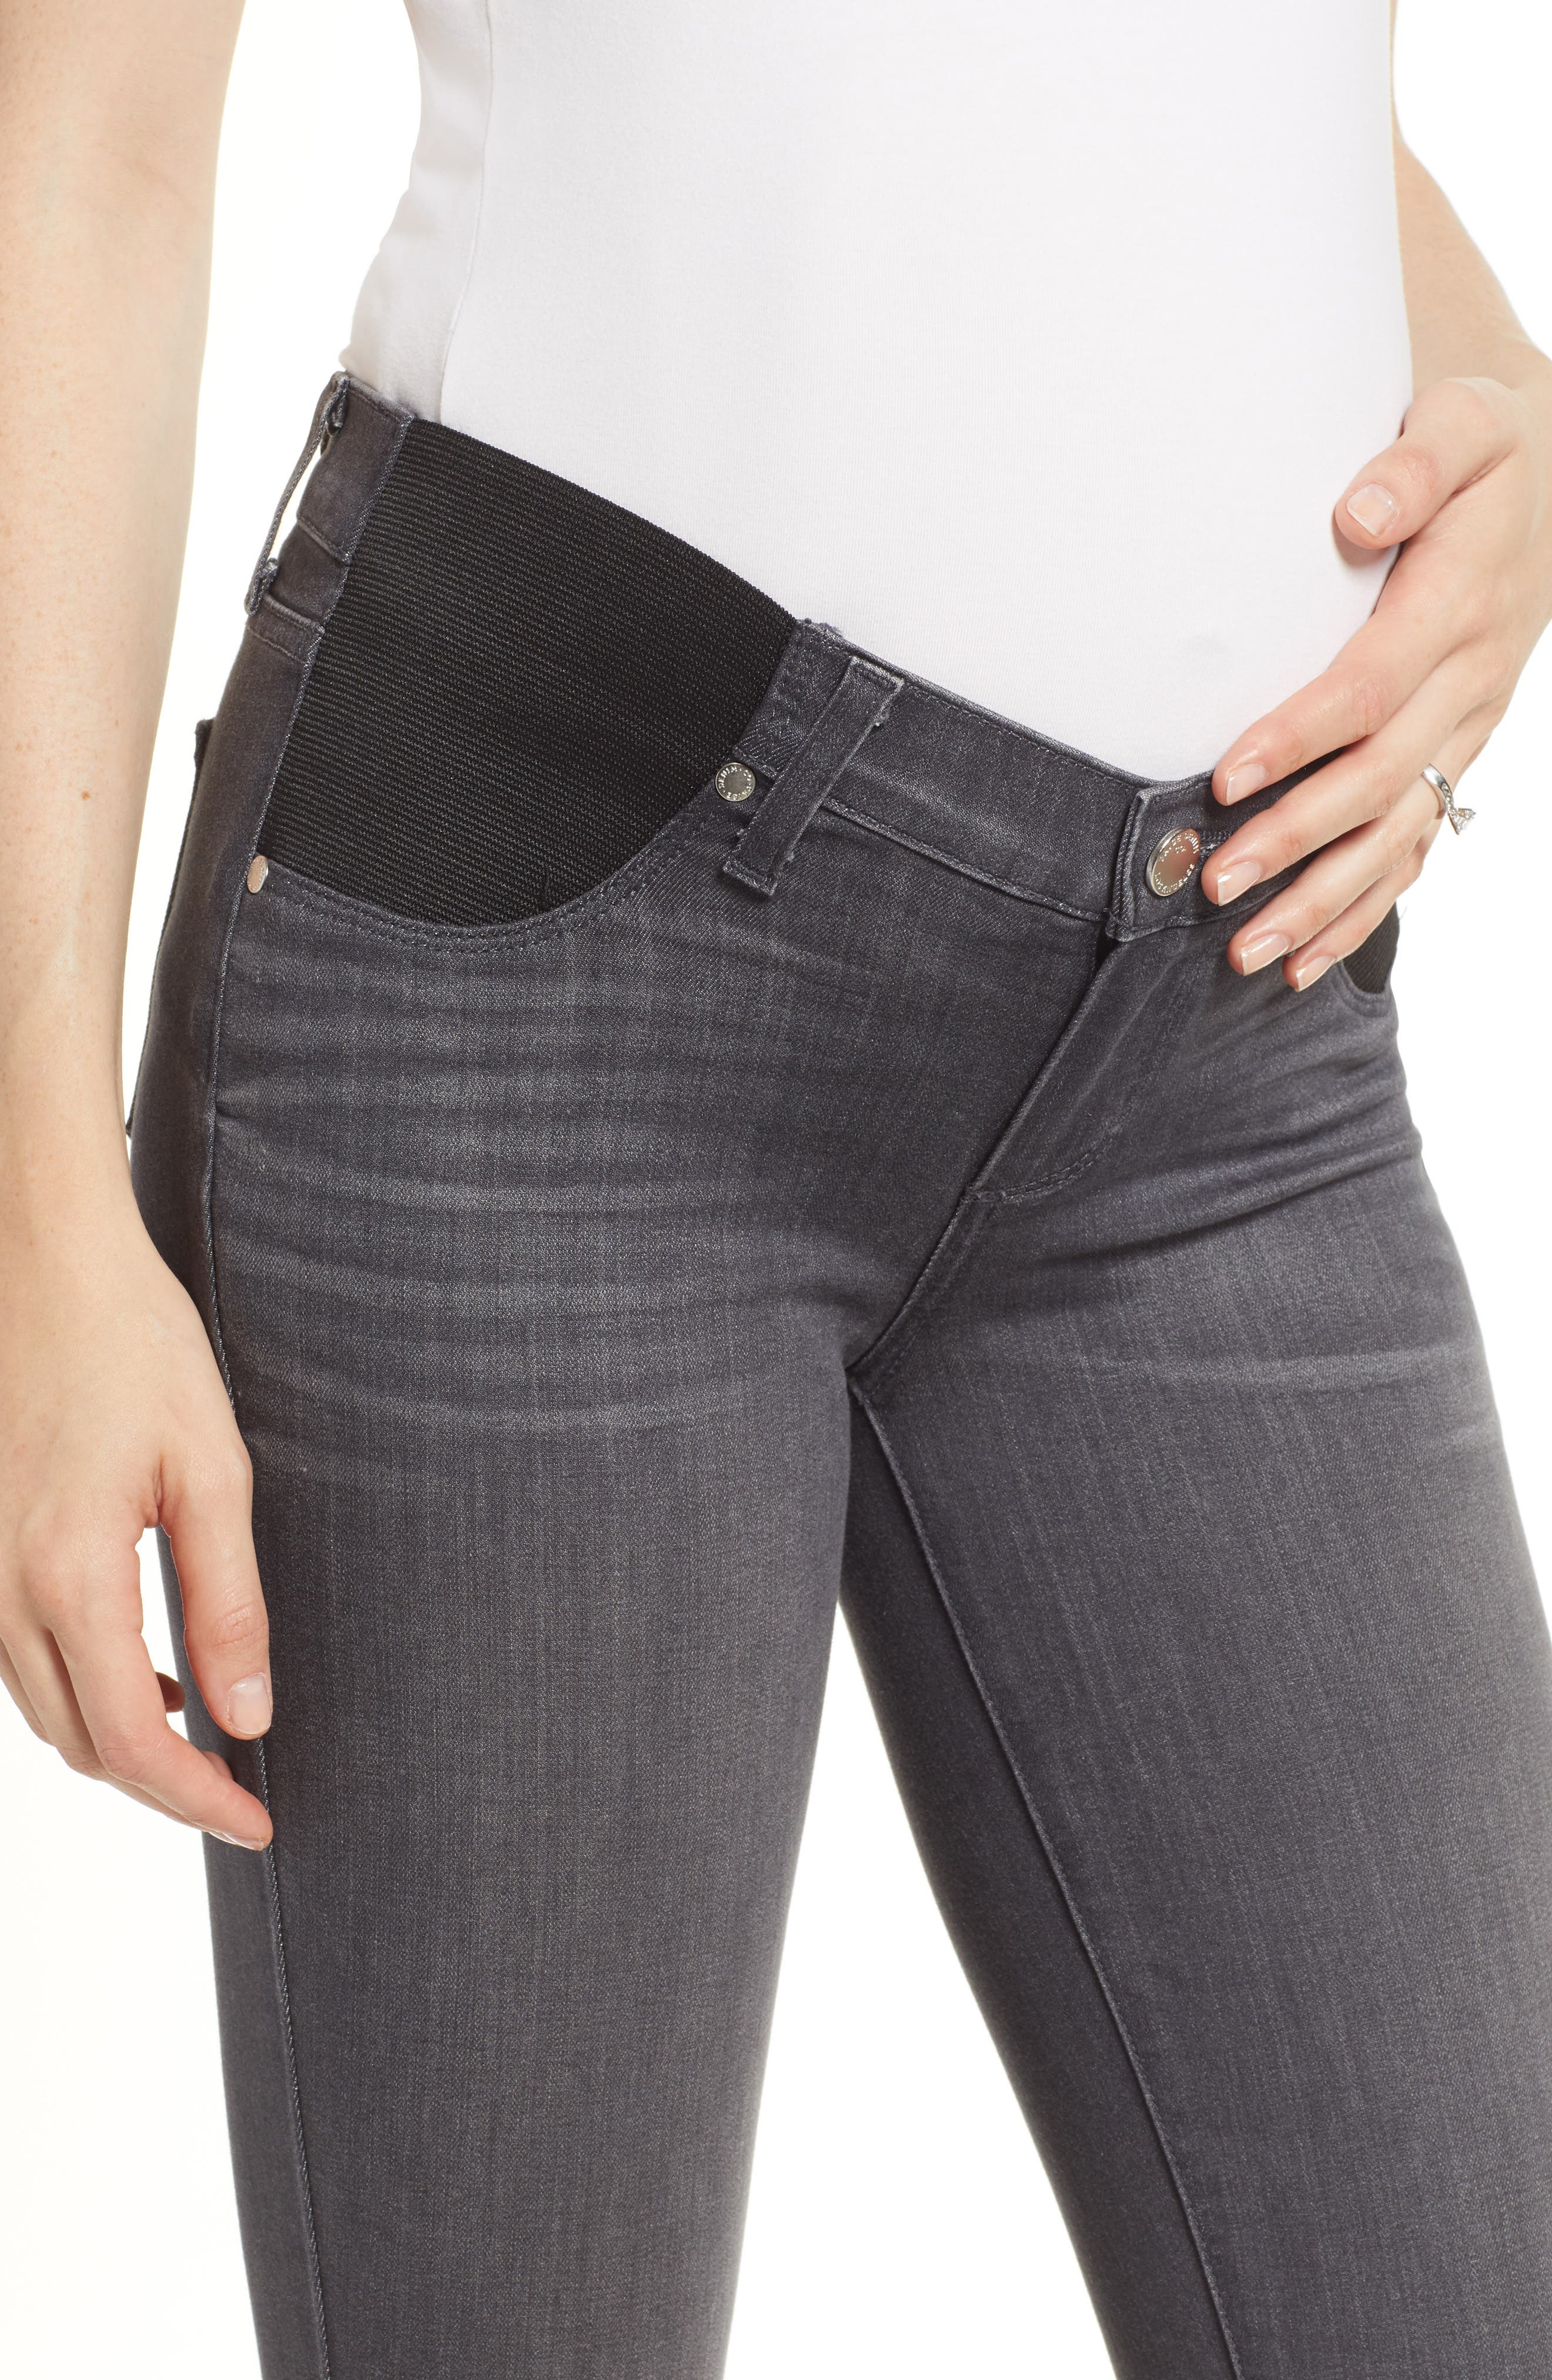 Transcend - Verdugo Maternity Skinny Jeans,                             Alternate thumbnail 4, color,                             GREY PEAKS